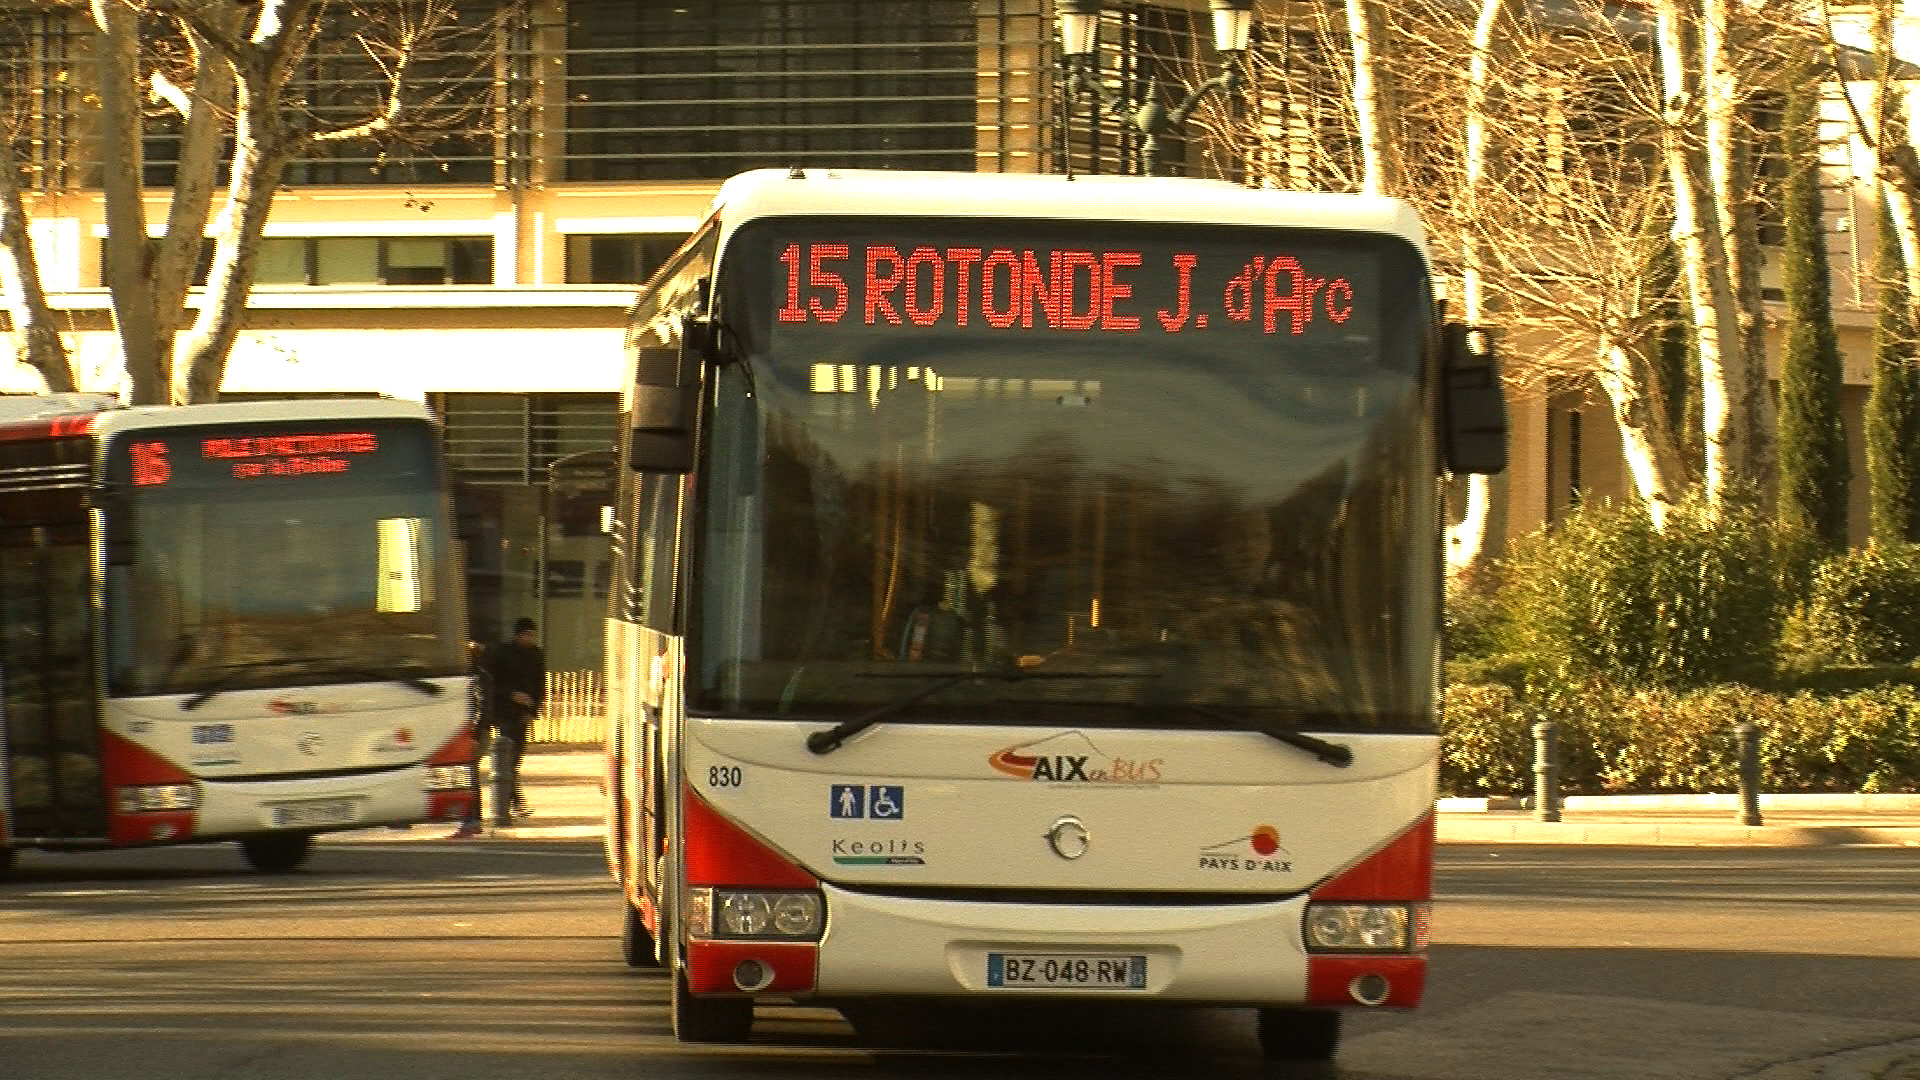 Vie des communes aix en provence aix - Aix en provence salon de provence bus ...